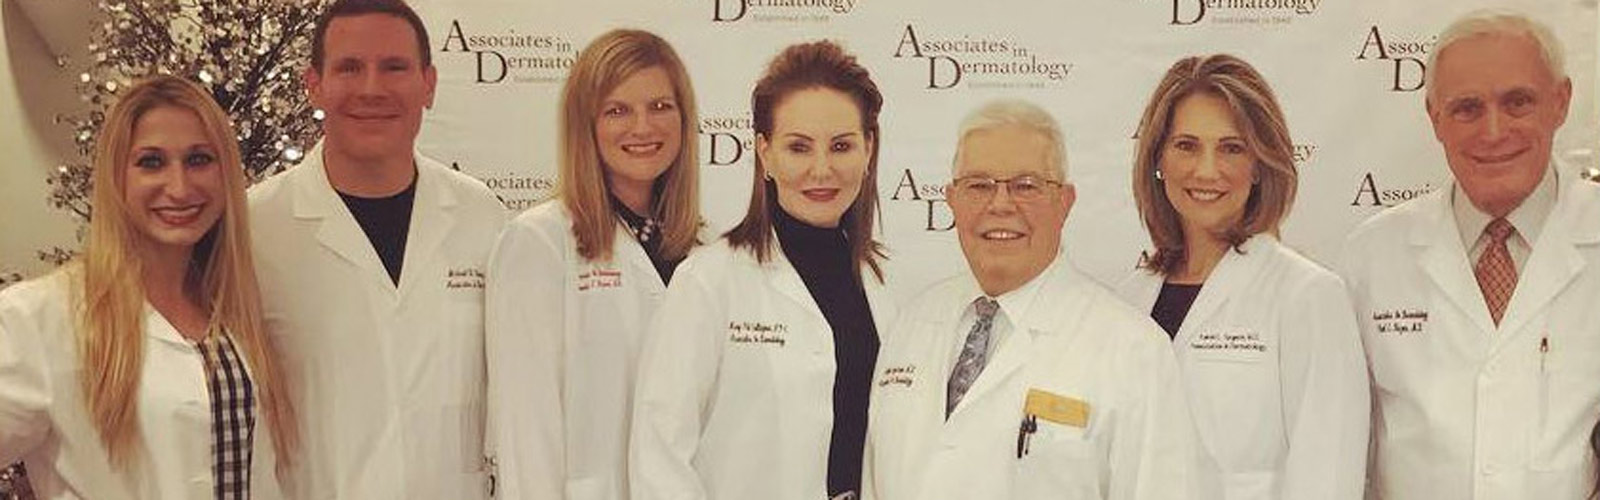 Associates In Dermatology - Team